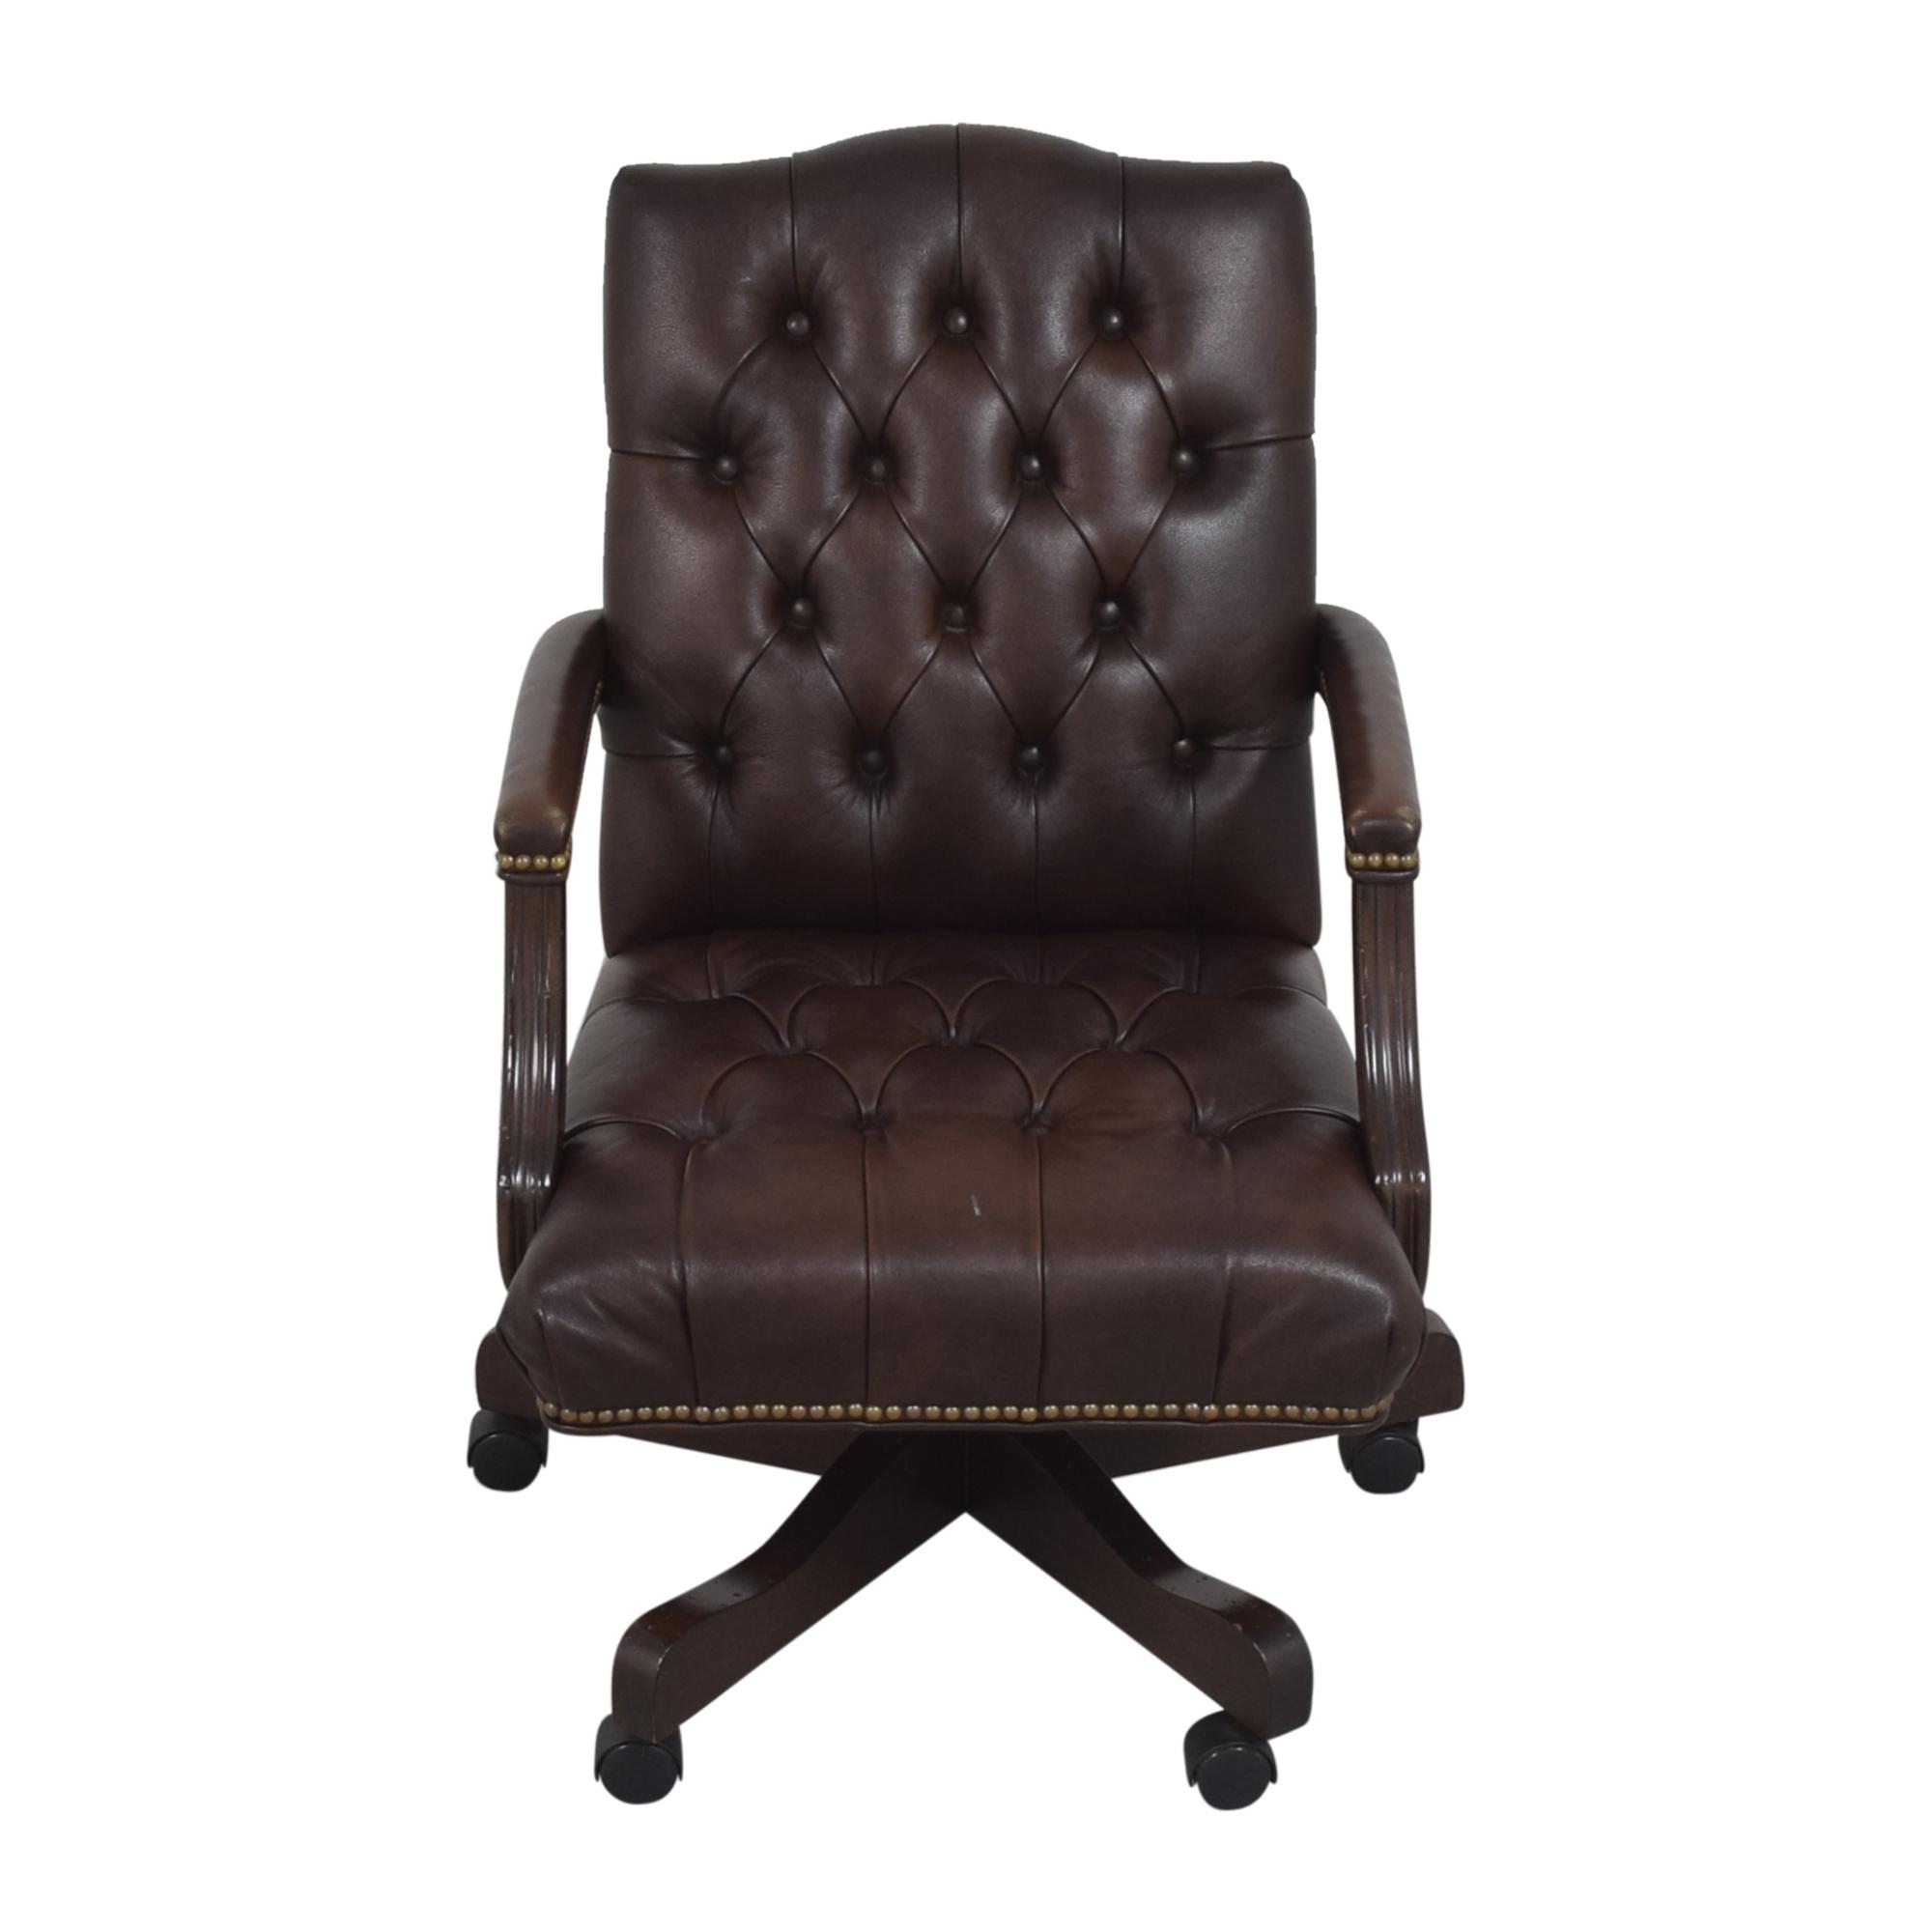 Ethan Allen Ethan Allen Grant Desk Chair dimensions